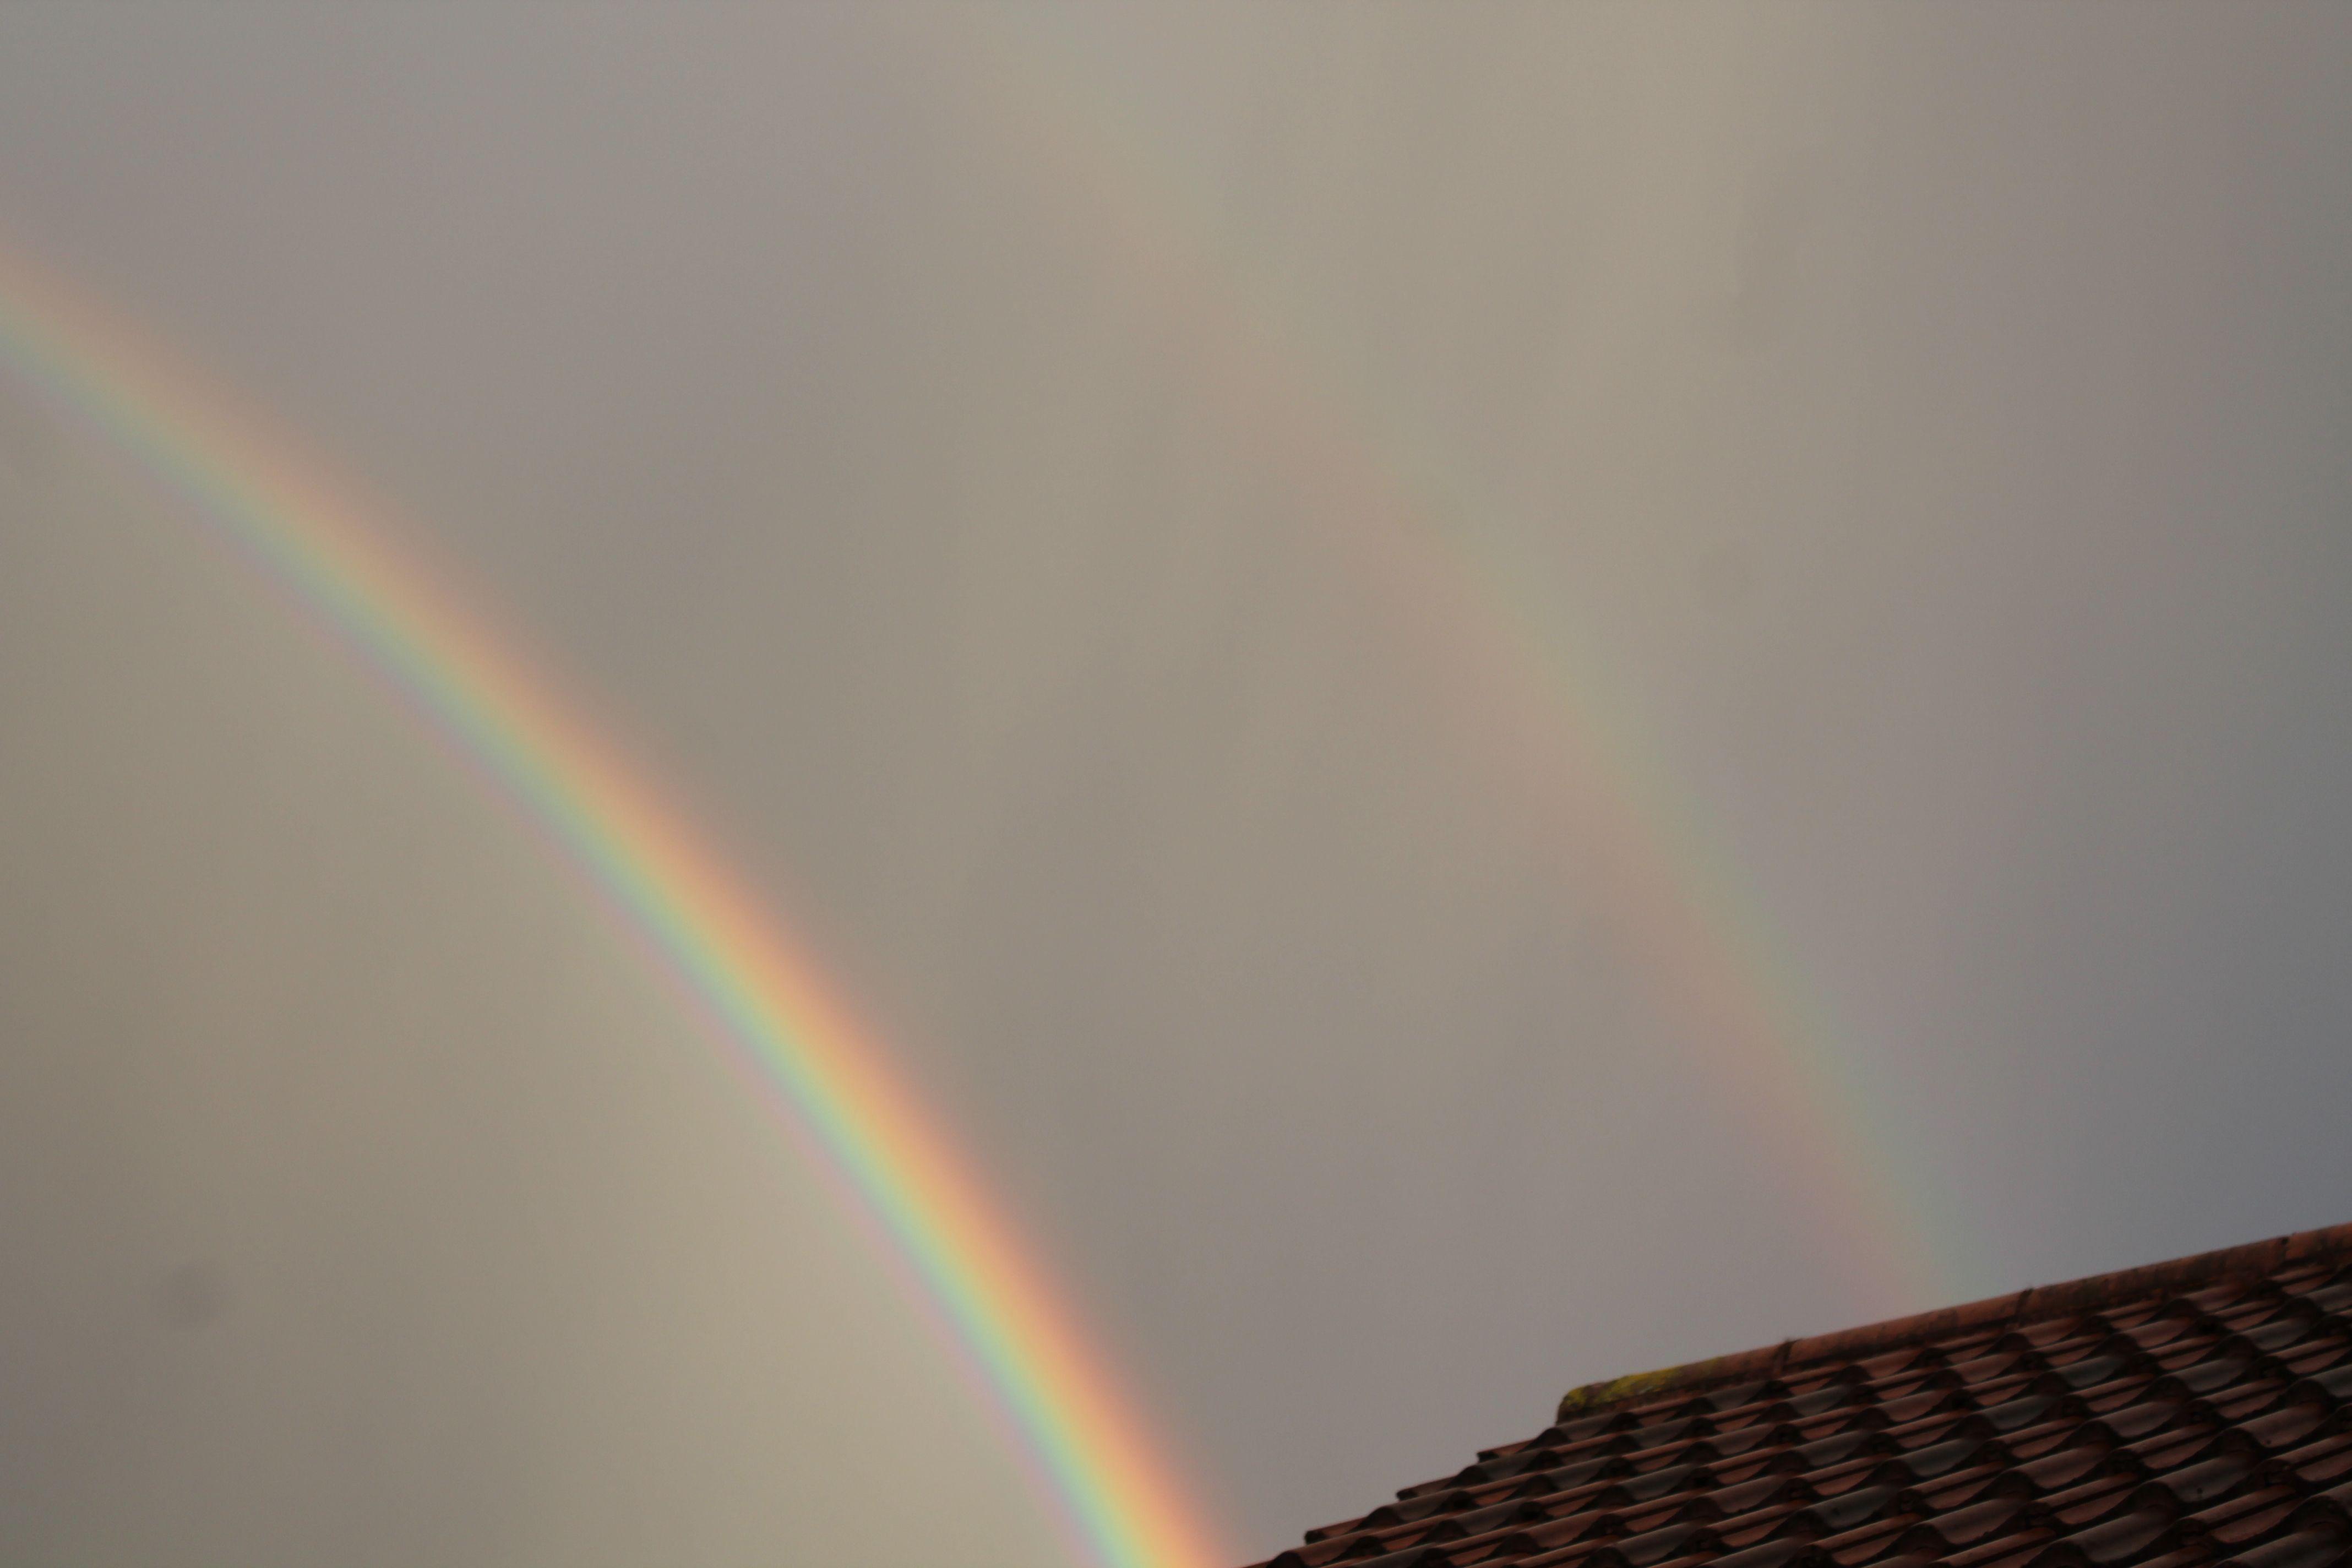 Double rainbow 25th April 2013